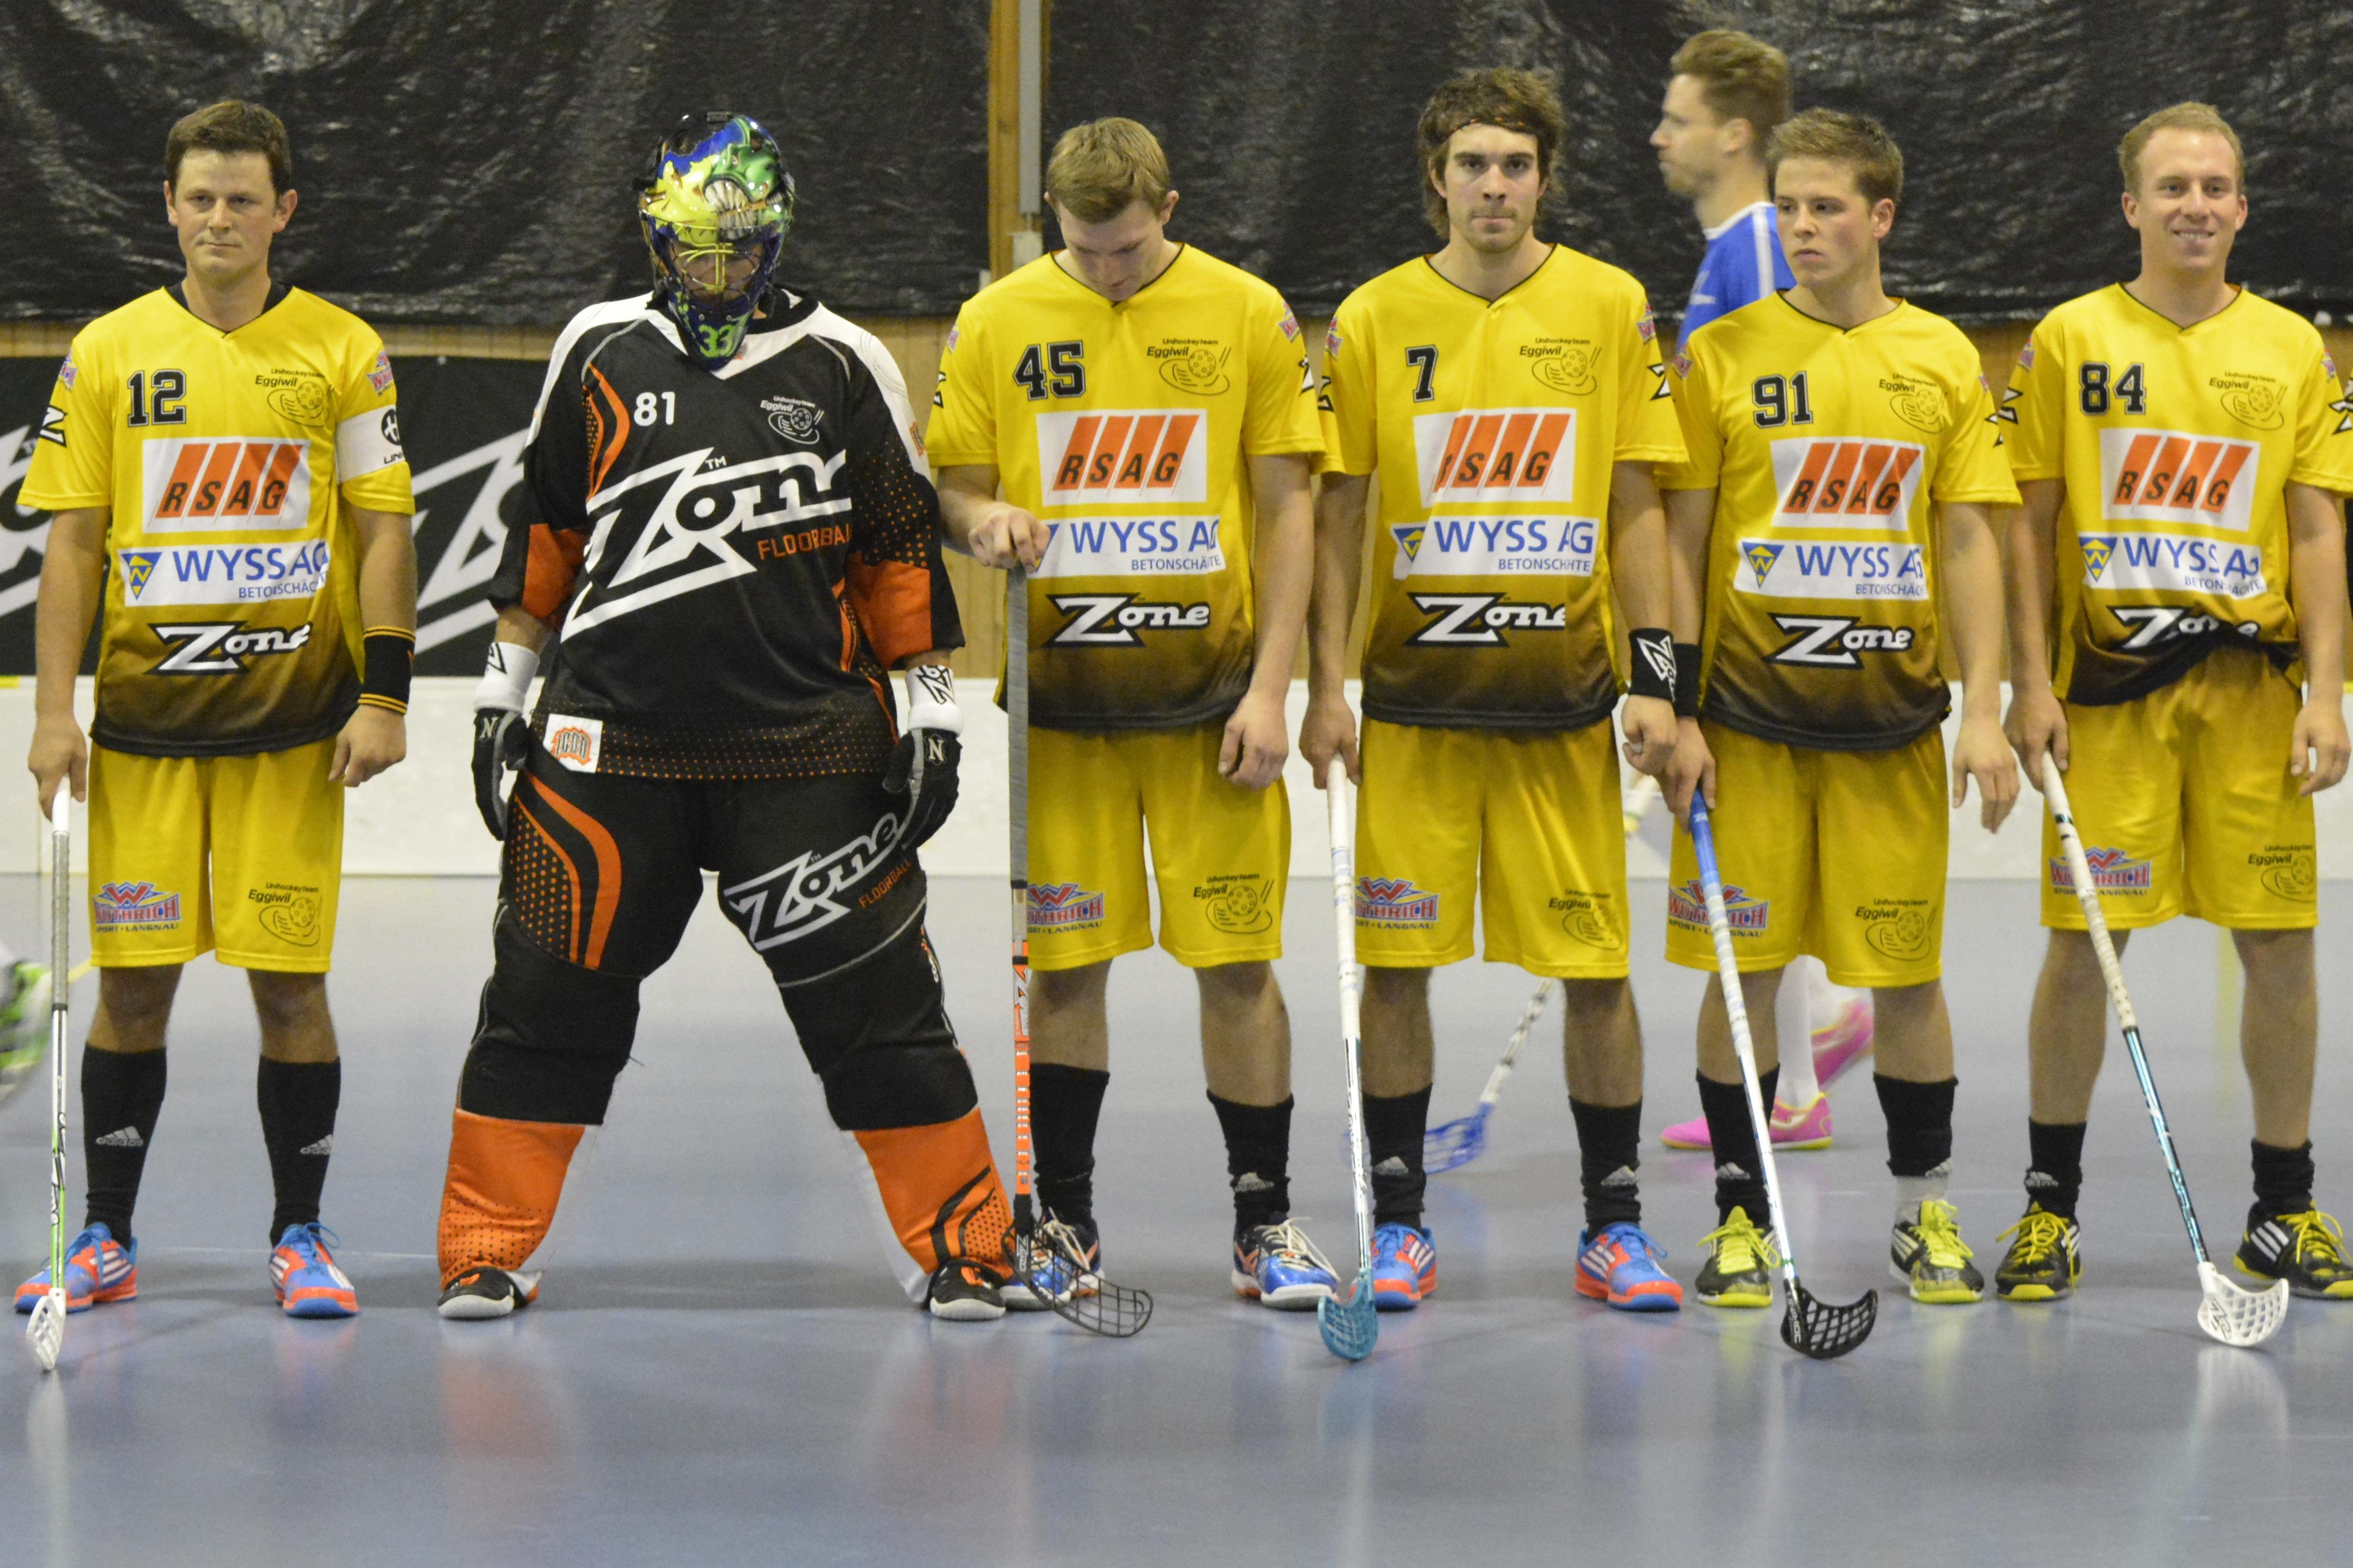 Herren NLB - Zürisee Unihockey Saison 2014/15